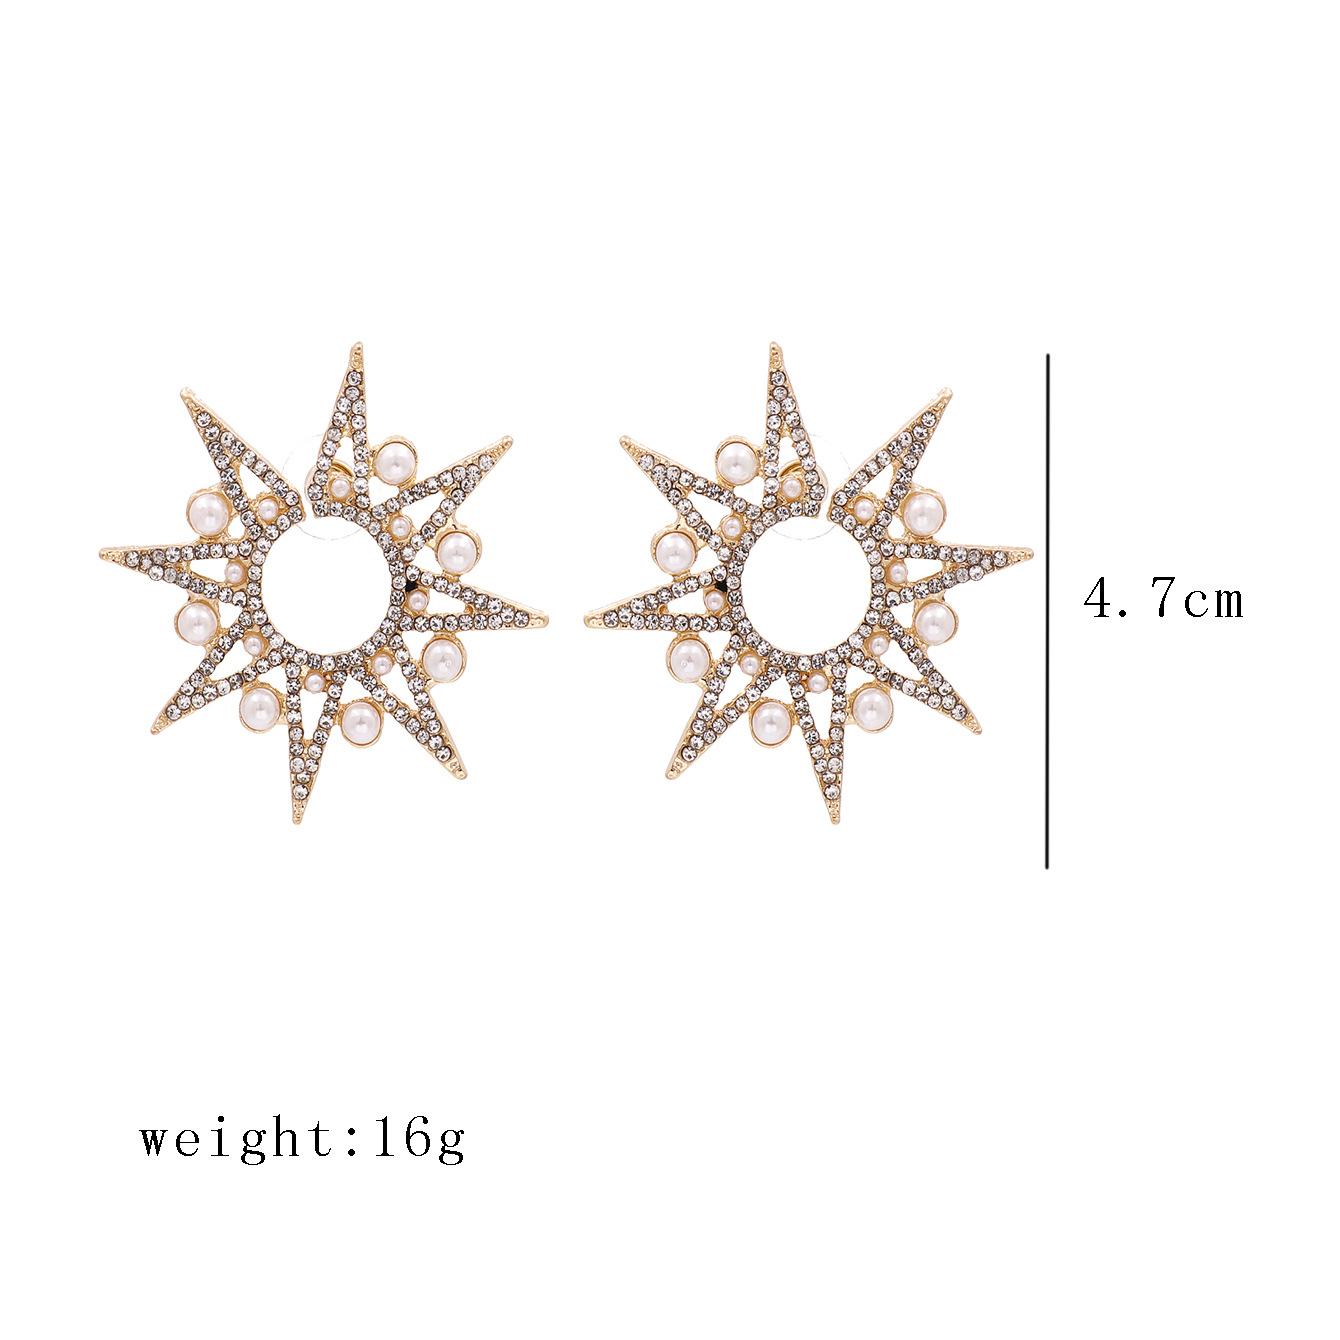 new rhinestone stars snowflake pearl earrings exaggerated large earrings wholesale nihaojewelry NHJJ227658